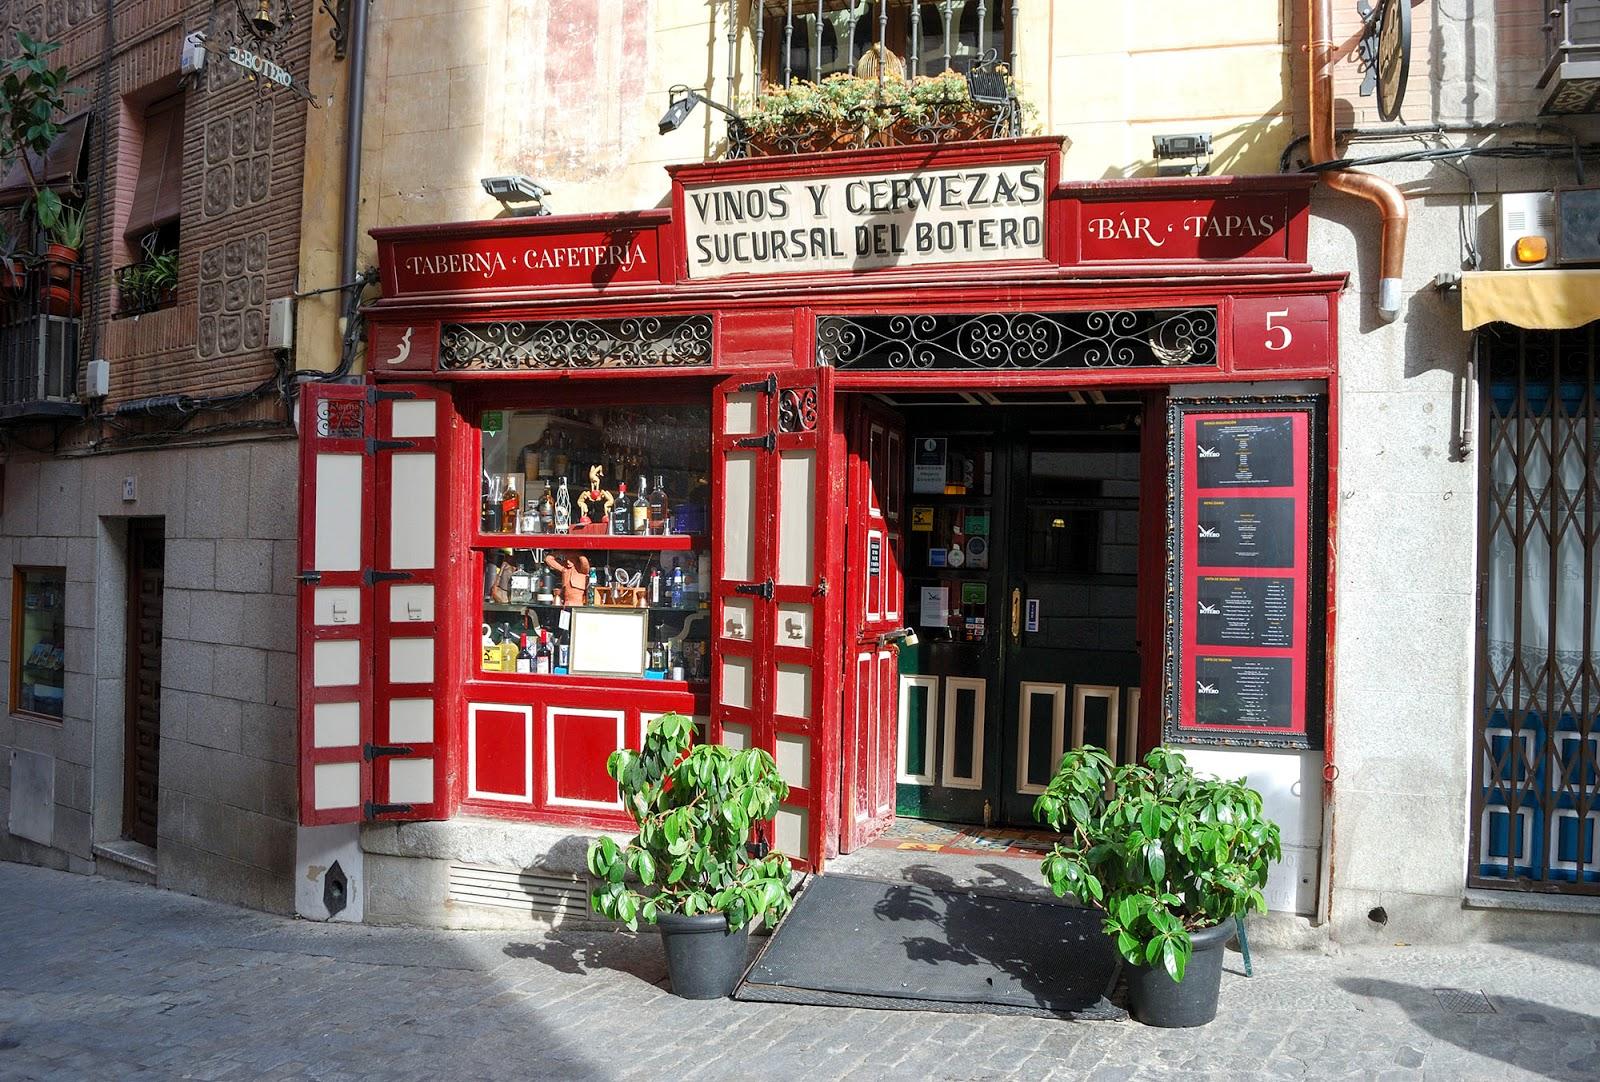 shop sword steel toledo spain landmark history travel guide tourism day trip itinerary